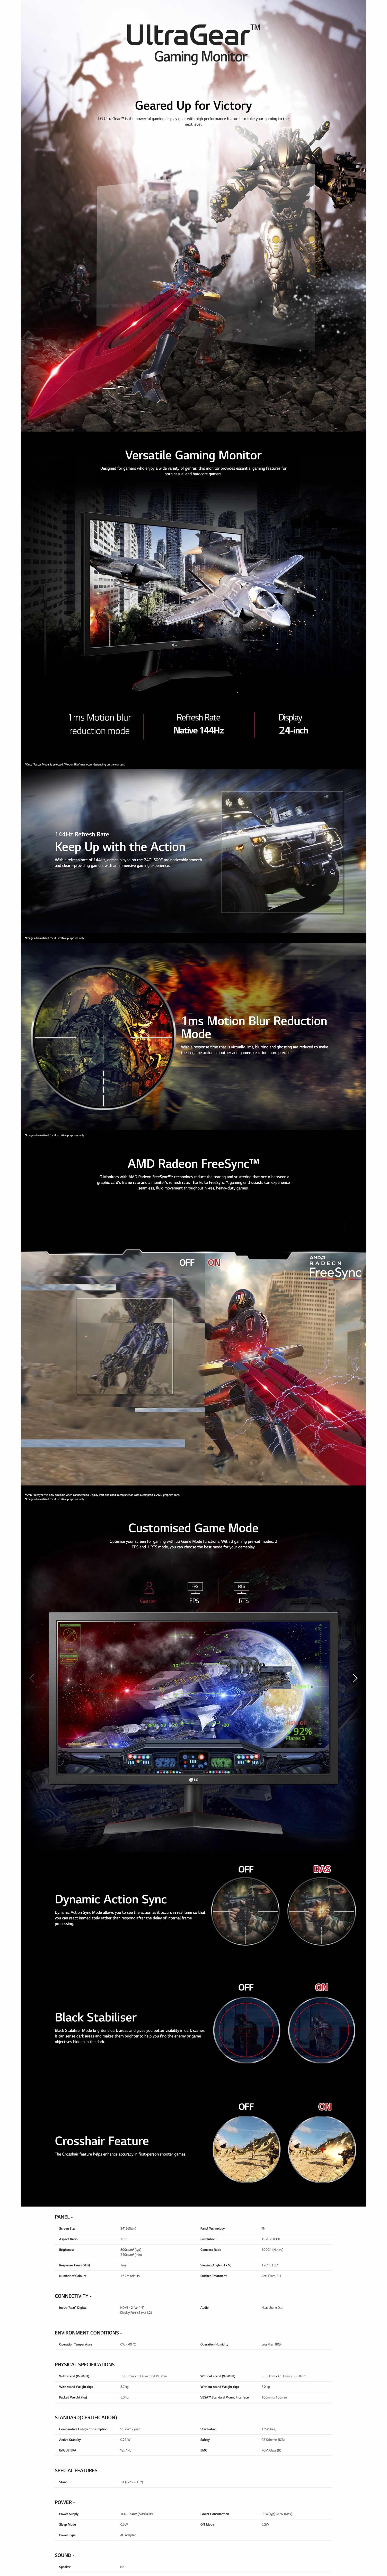 "LG 24GL600F-B 24"" 144Hz FHD TN FreeSync Gaming Monitor description and specs"